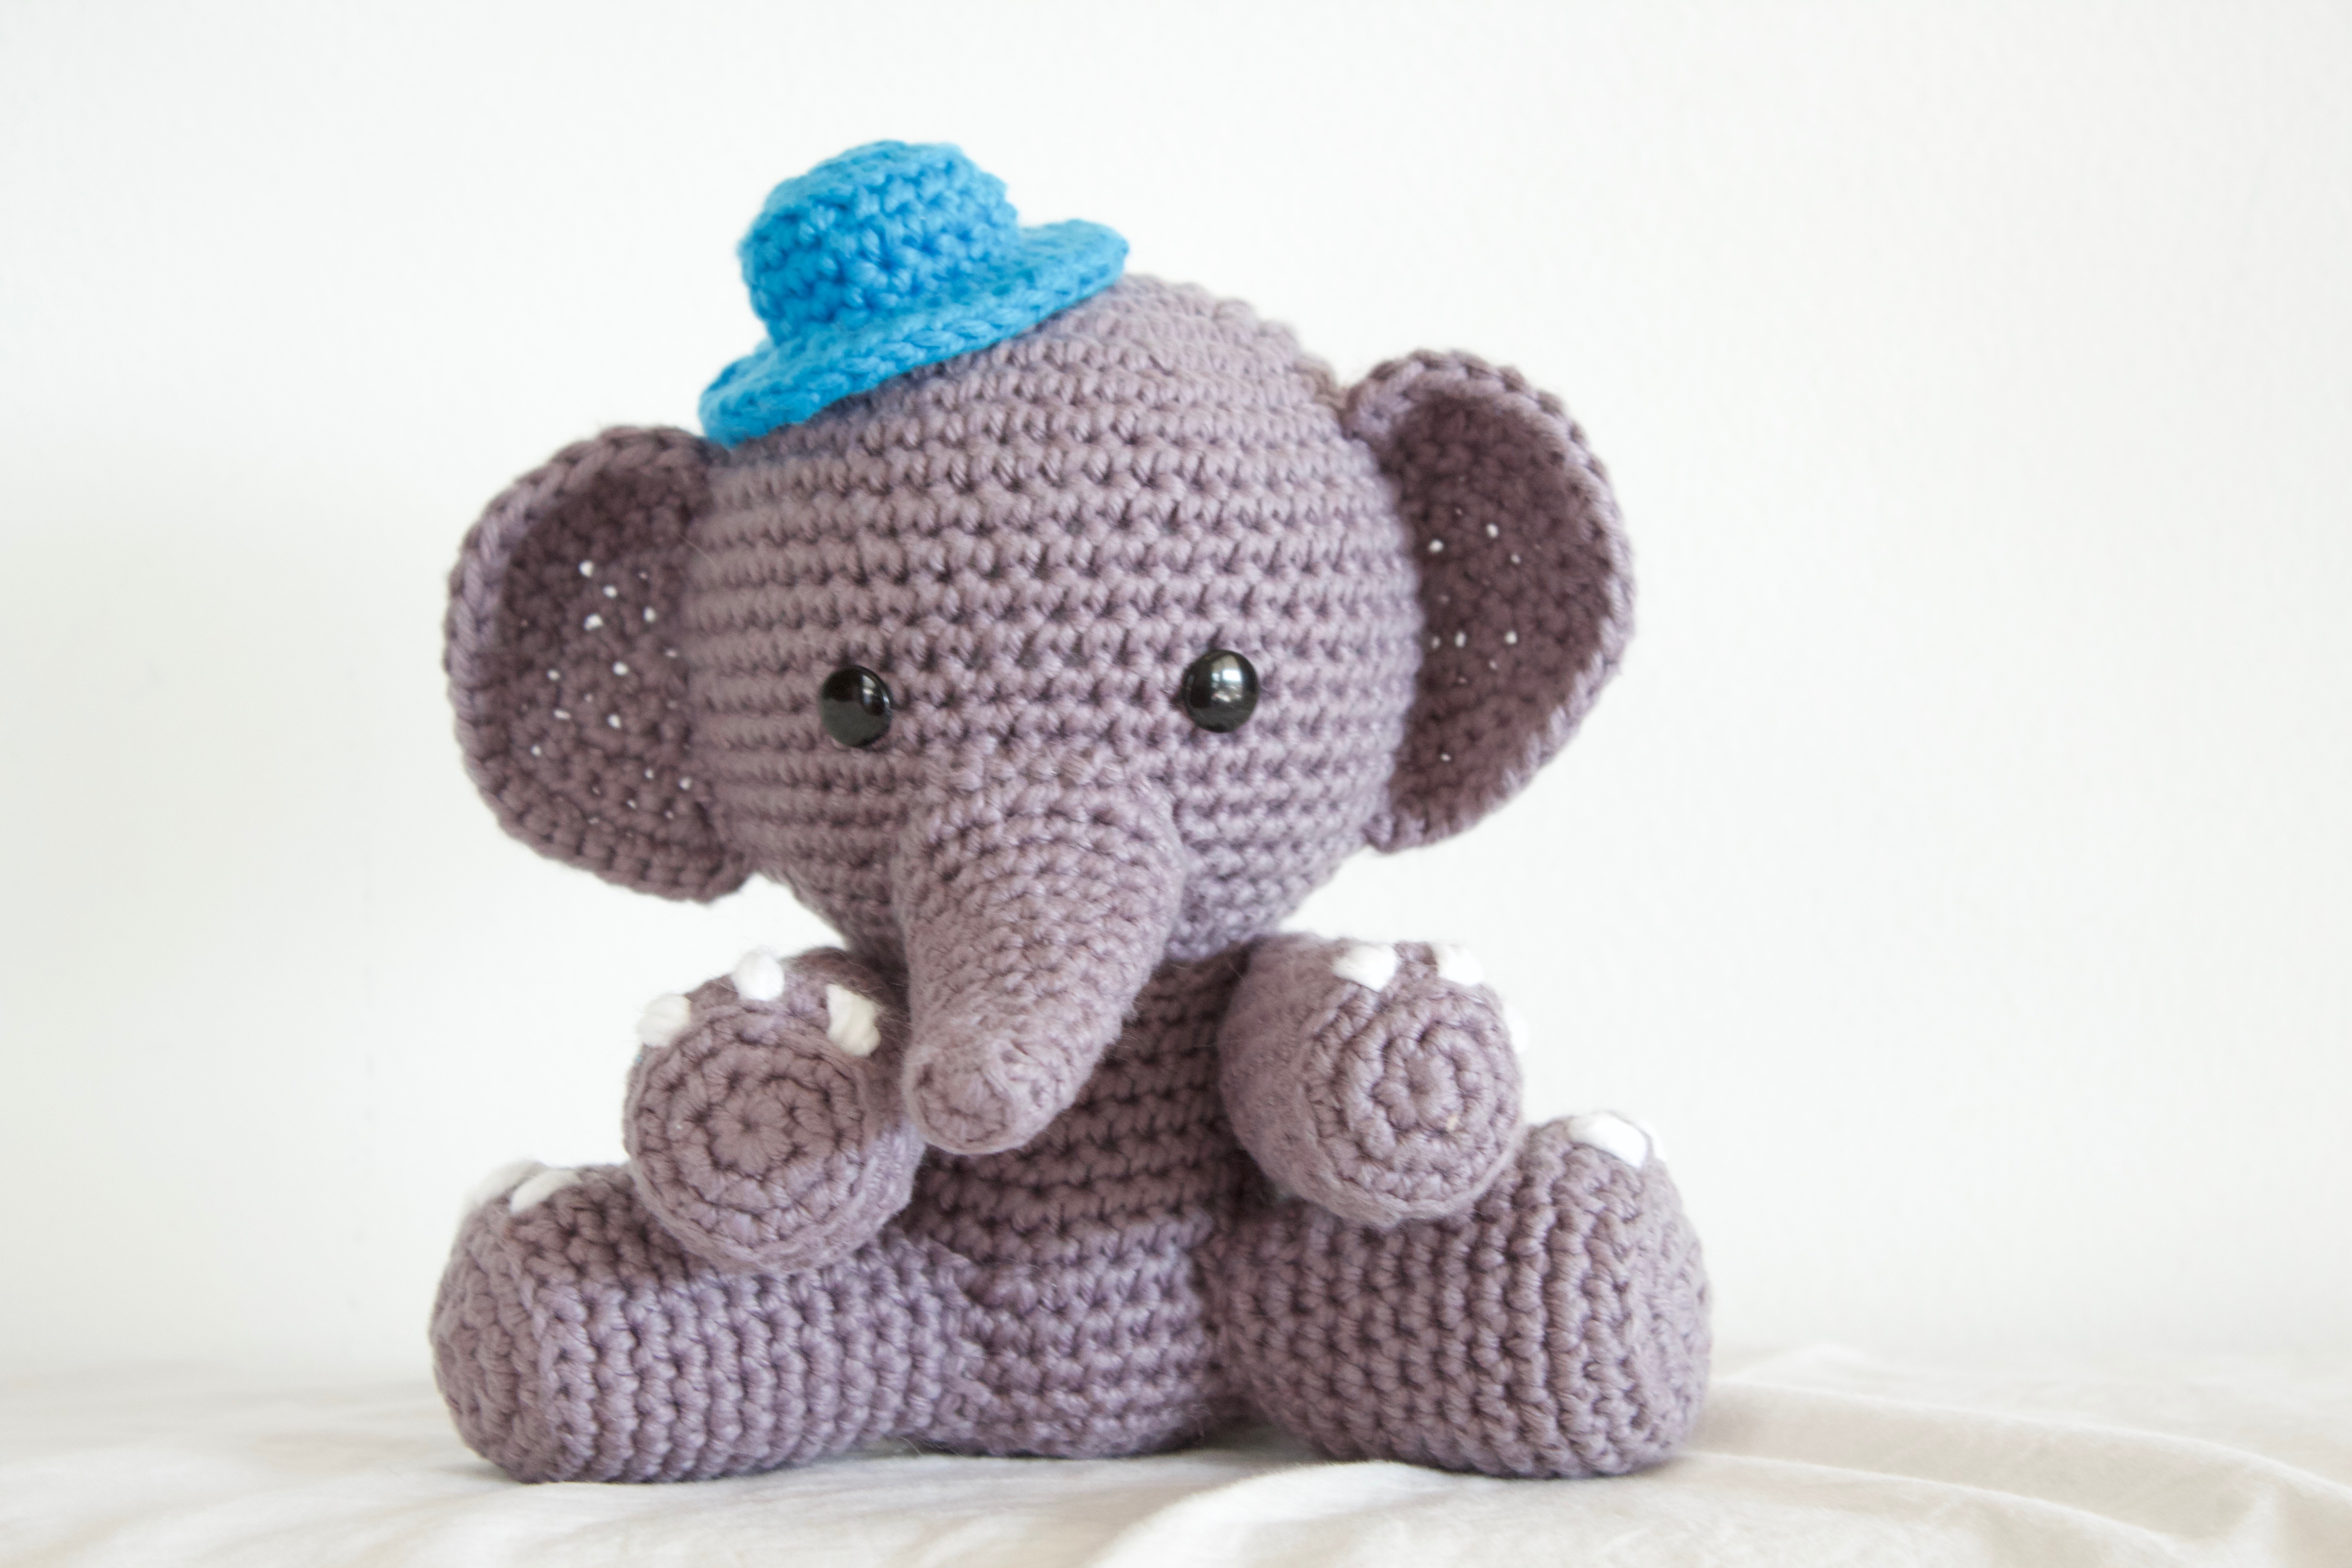 Crochet Amigurumi Elephant Pattern ( English only ) | Amigurumi ... | 3456x5184